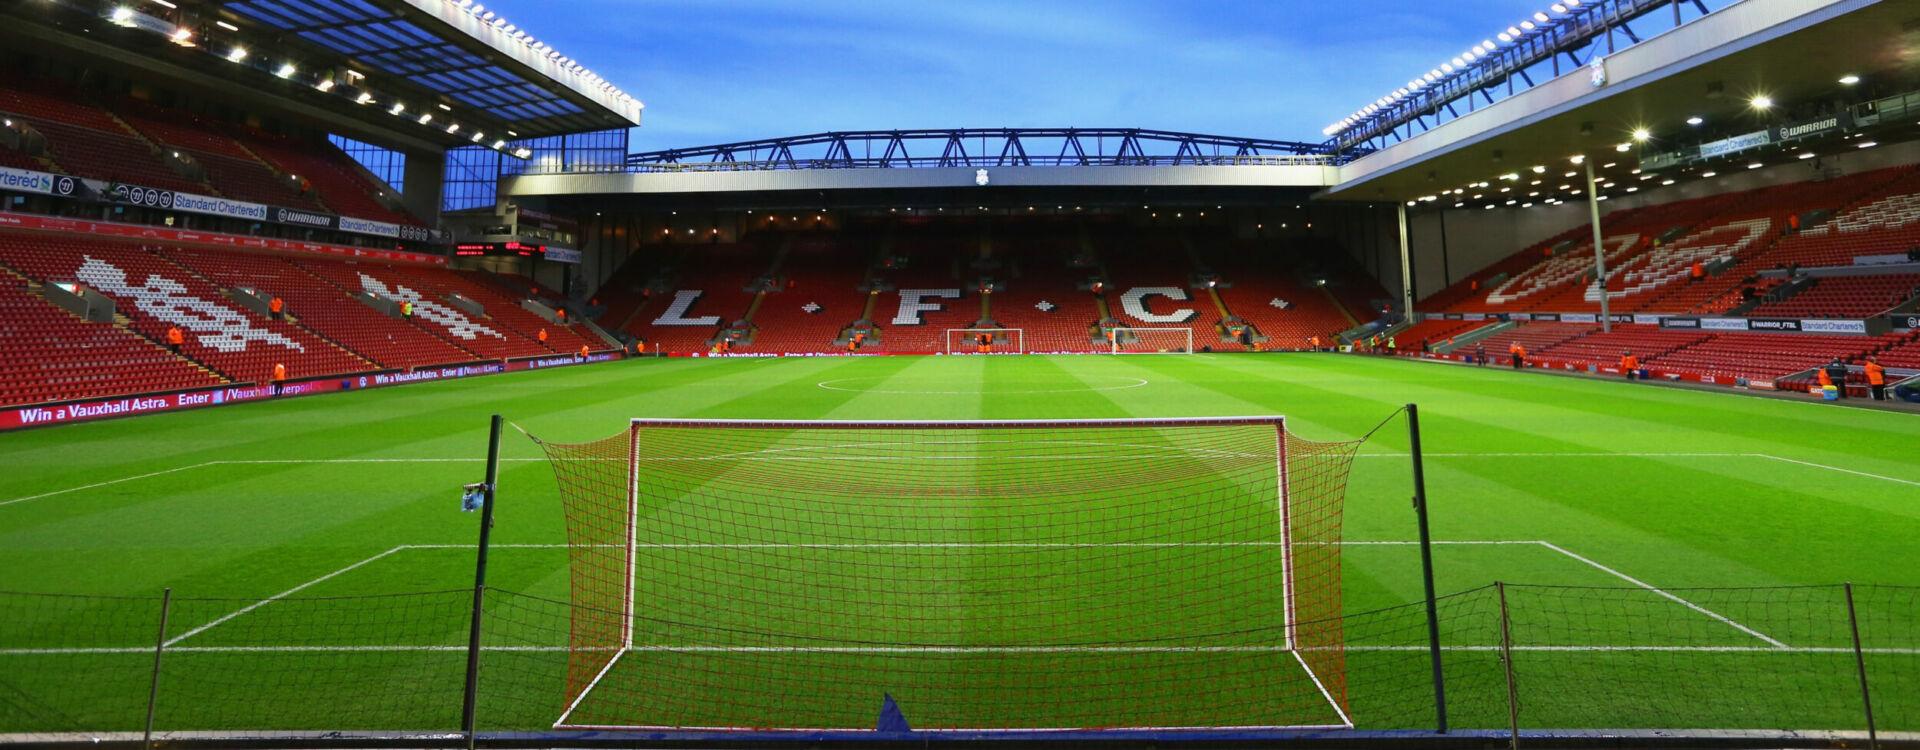 Liverpool football hospitality corporate event